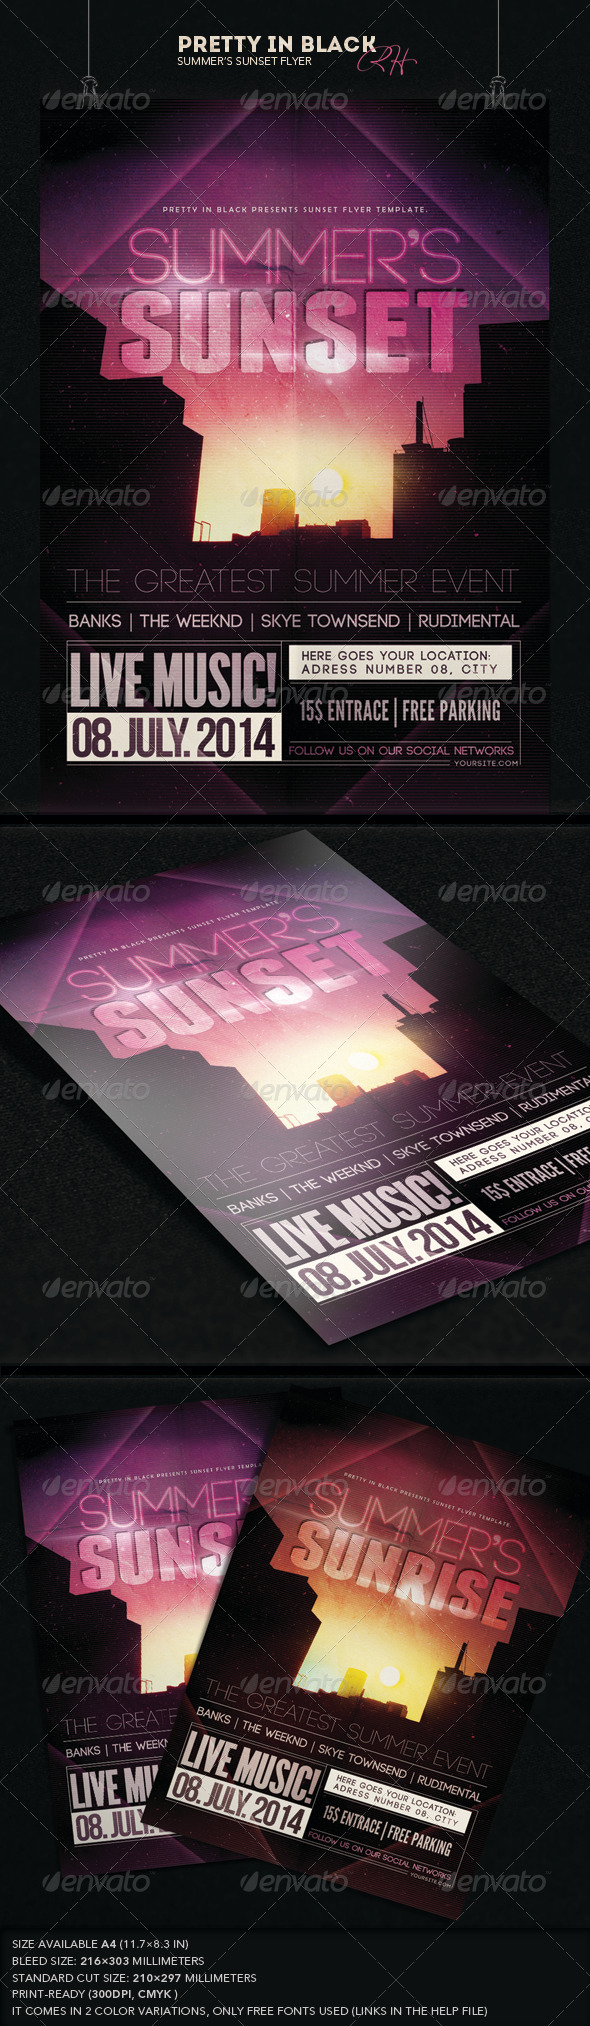 GraphicRiver Summer s Sunset Flyer 7828127